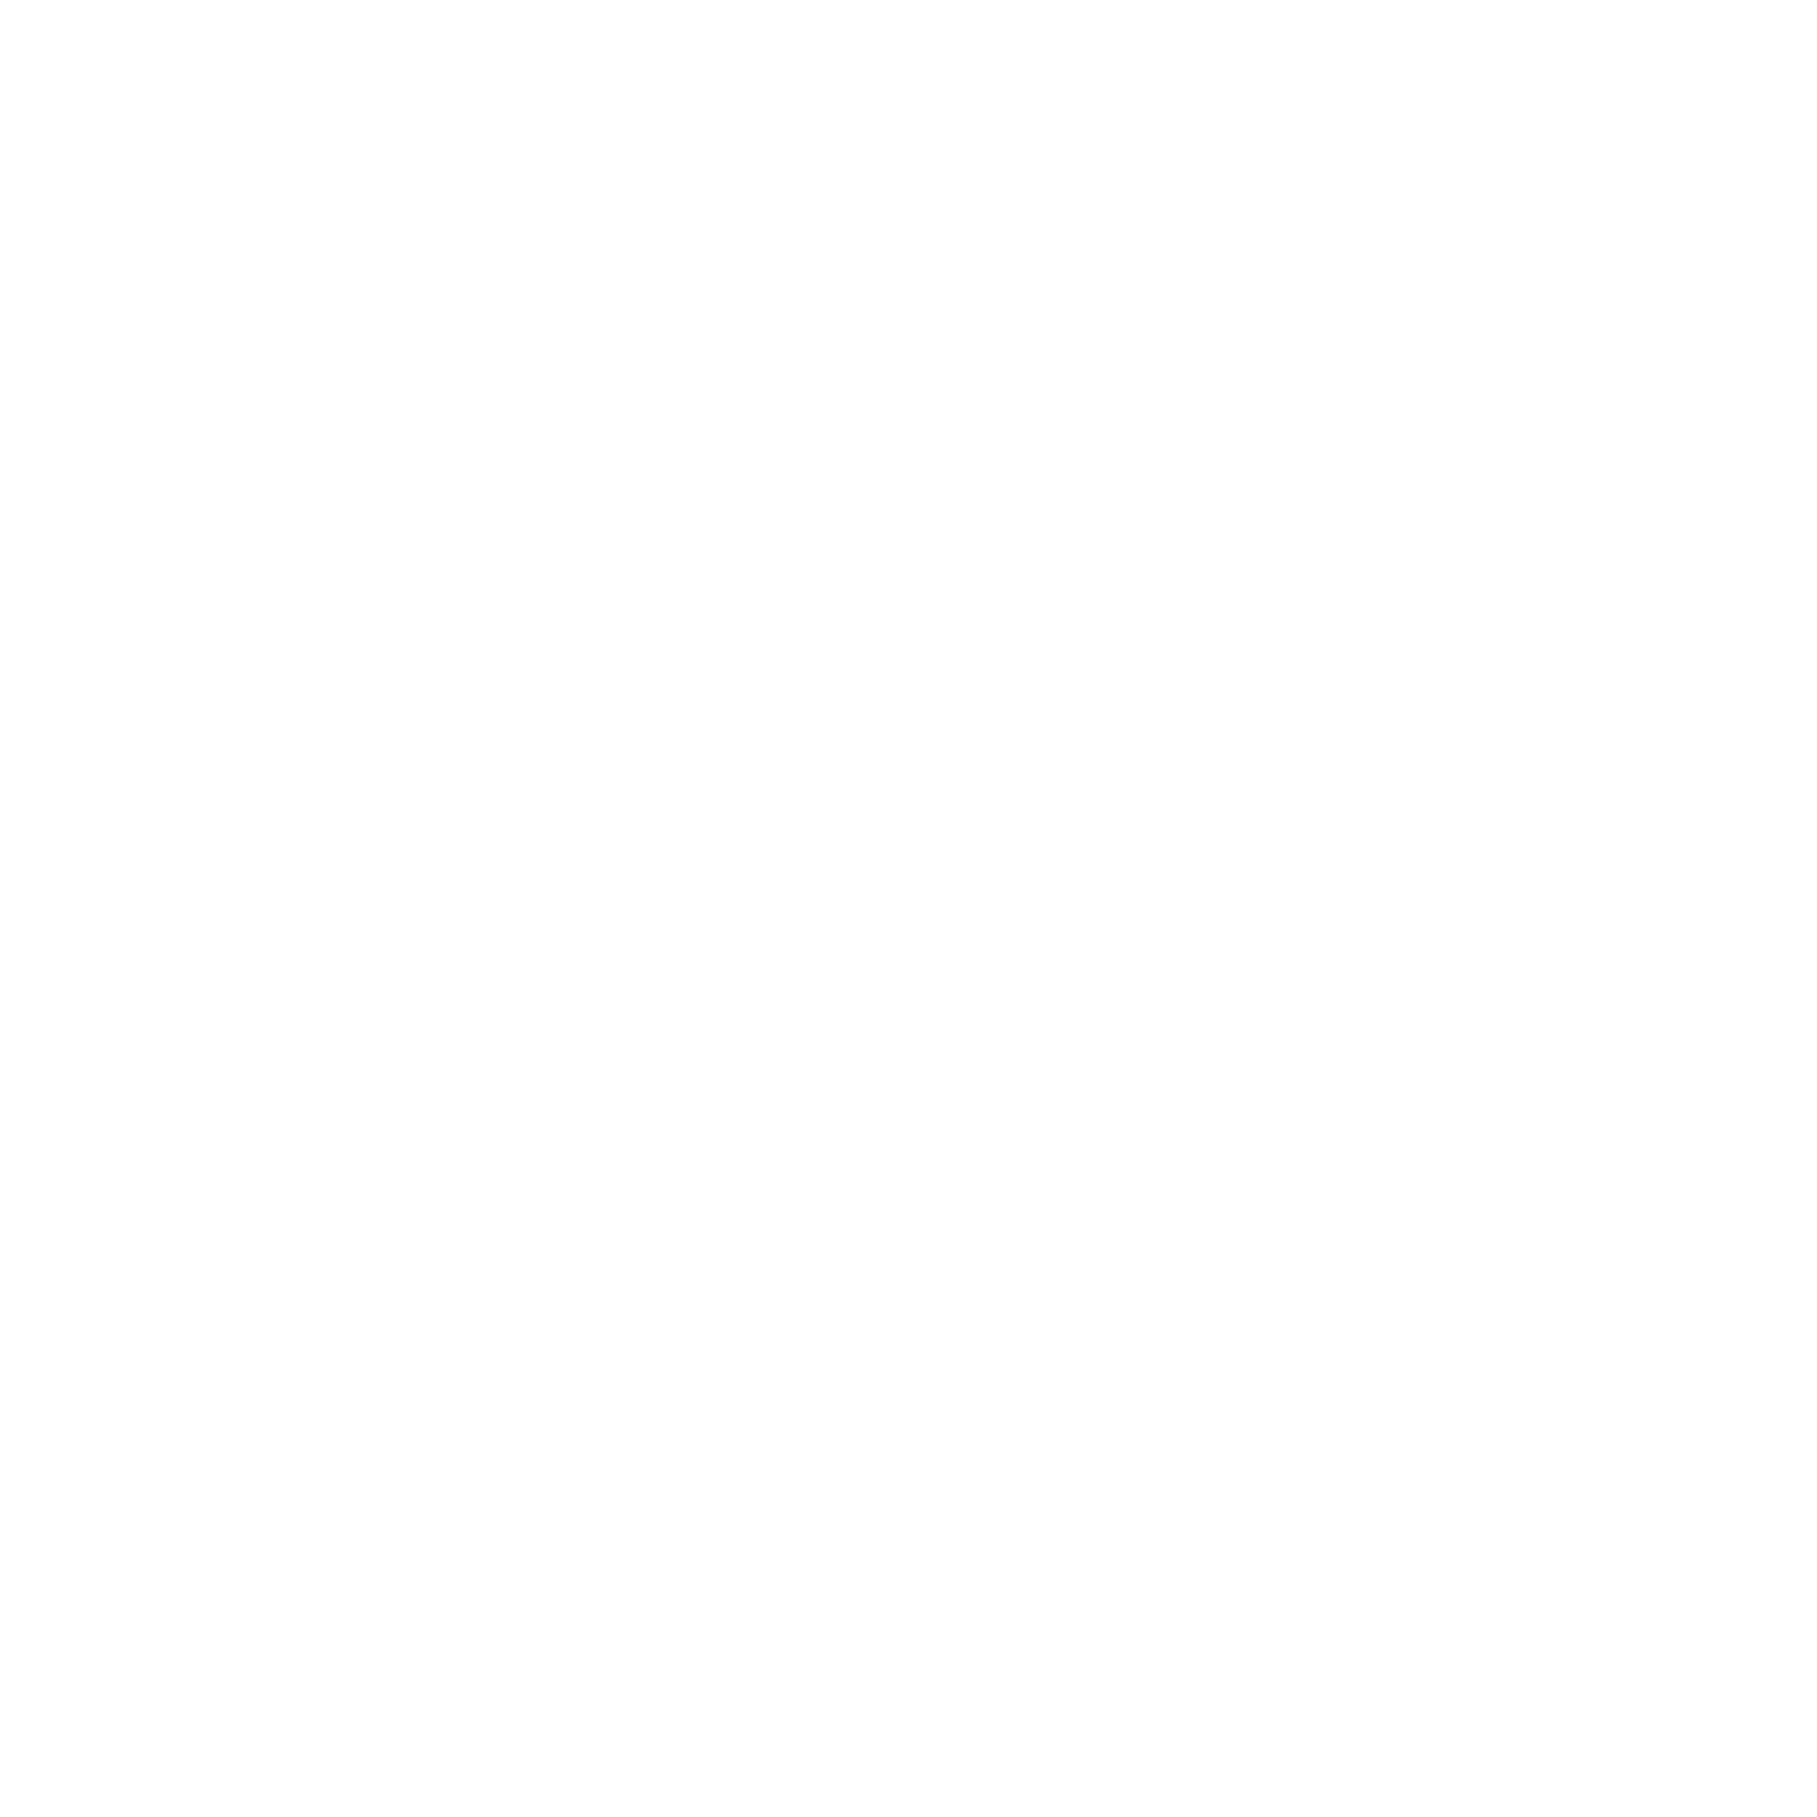 LOGO - clients white_Aliphos